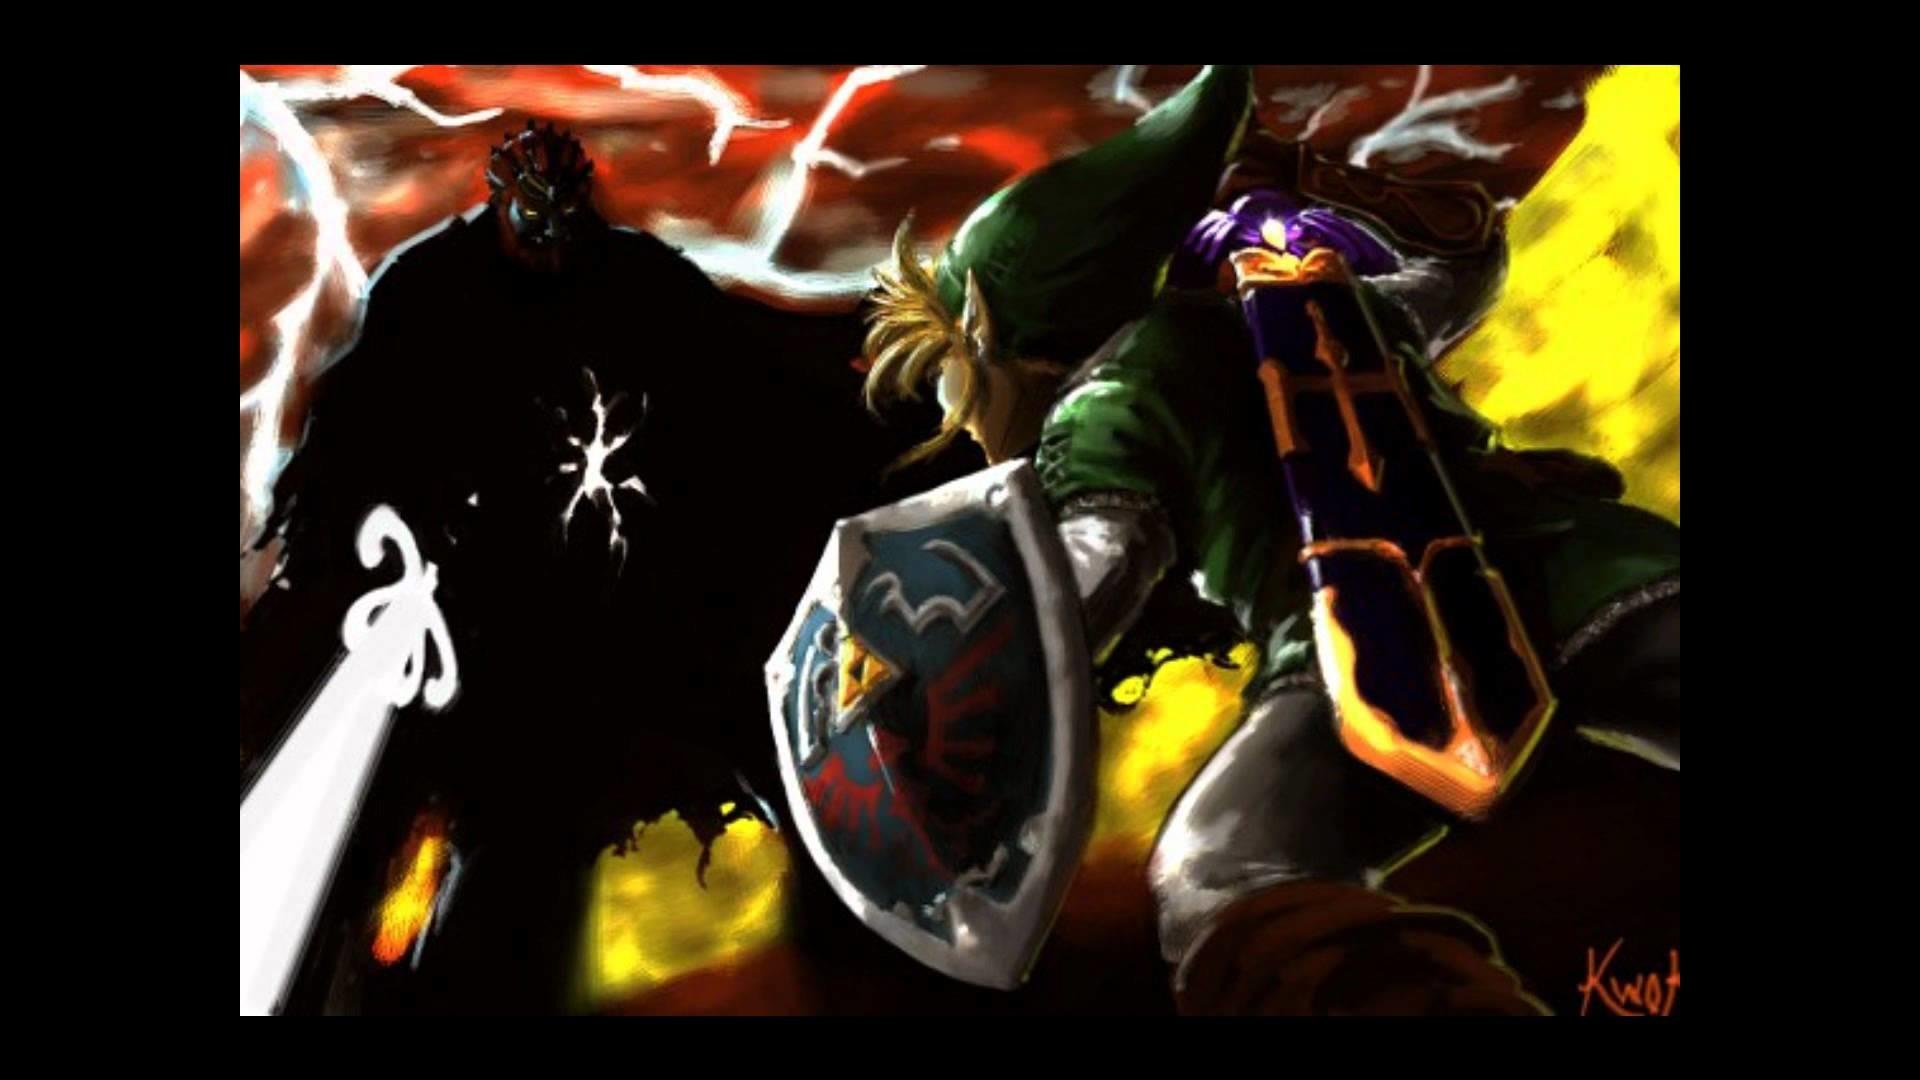 [The Legend of Zelda Twilight Princess] Final Boss Dark Lord Ganondorf  -SwordFight-